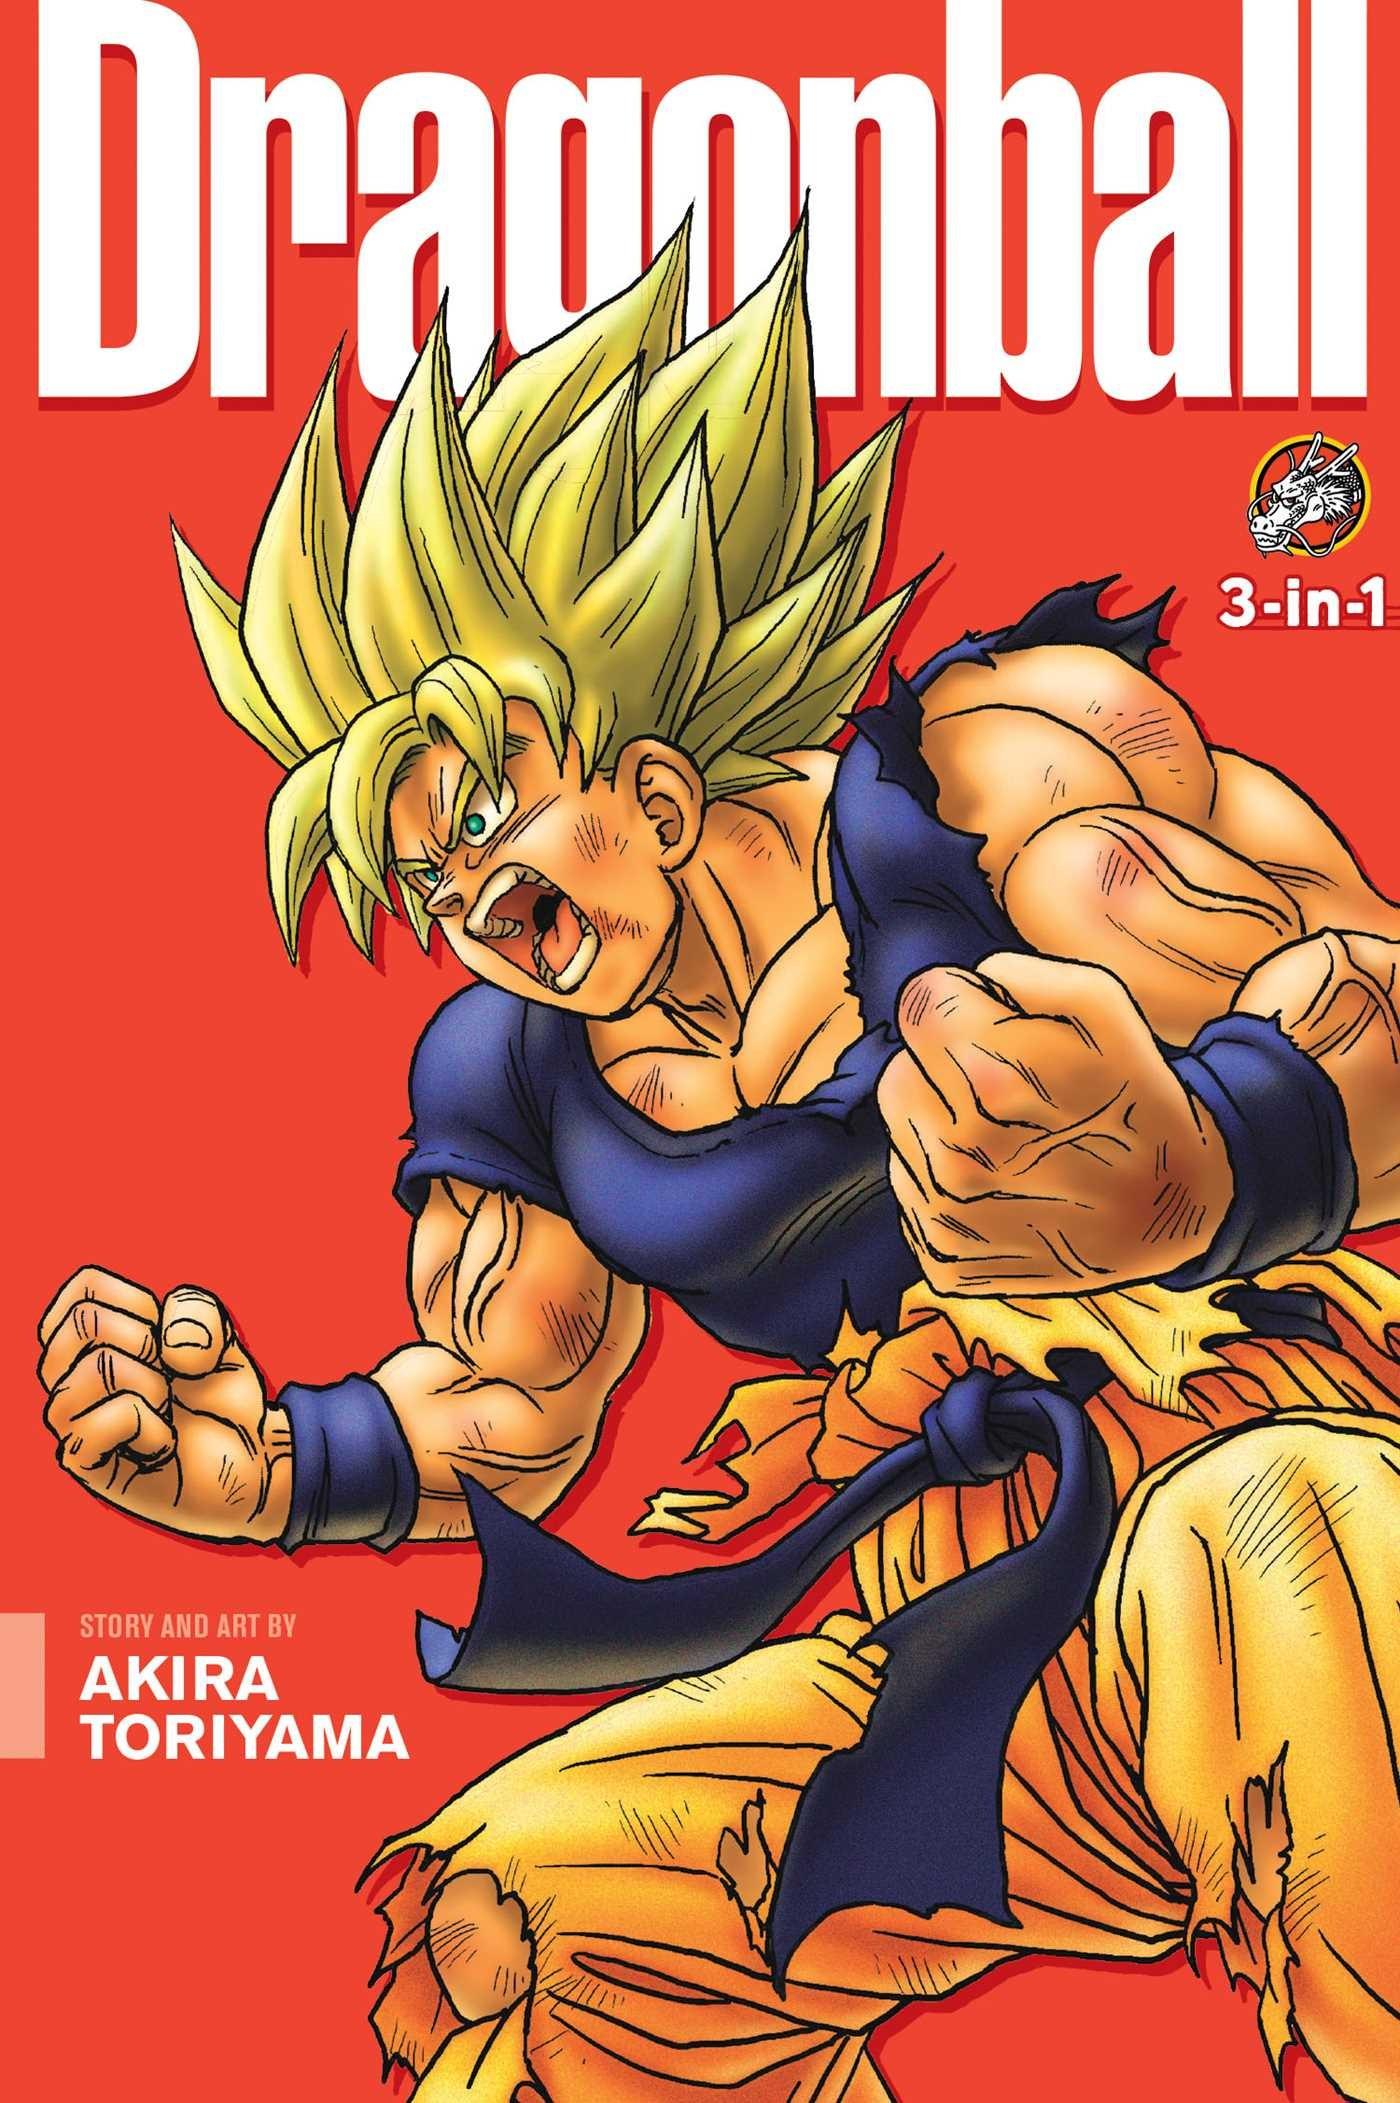 Dragon Ball (3-in-1 Edition), Vol. 09 by Akira Toriyama